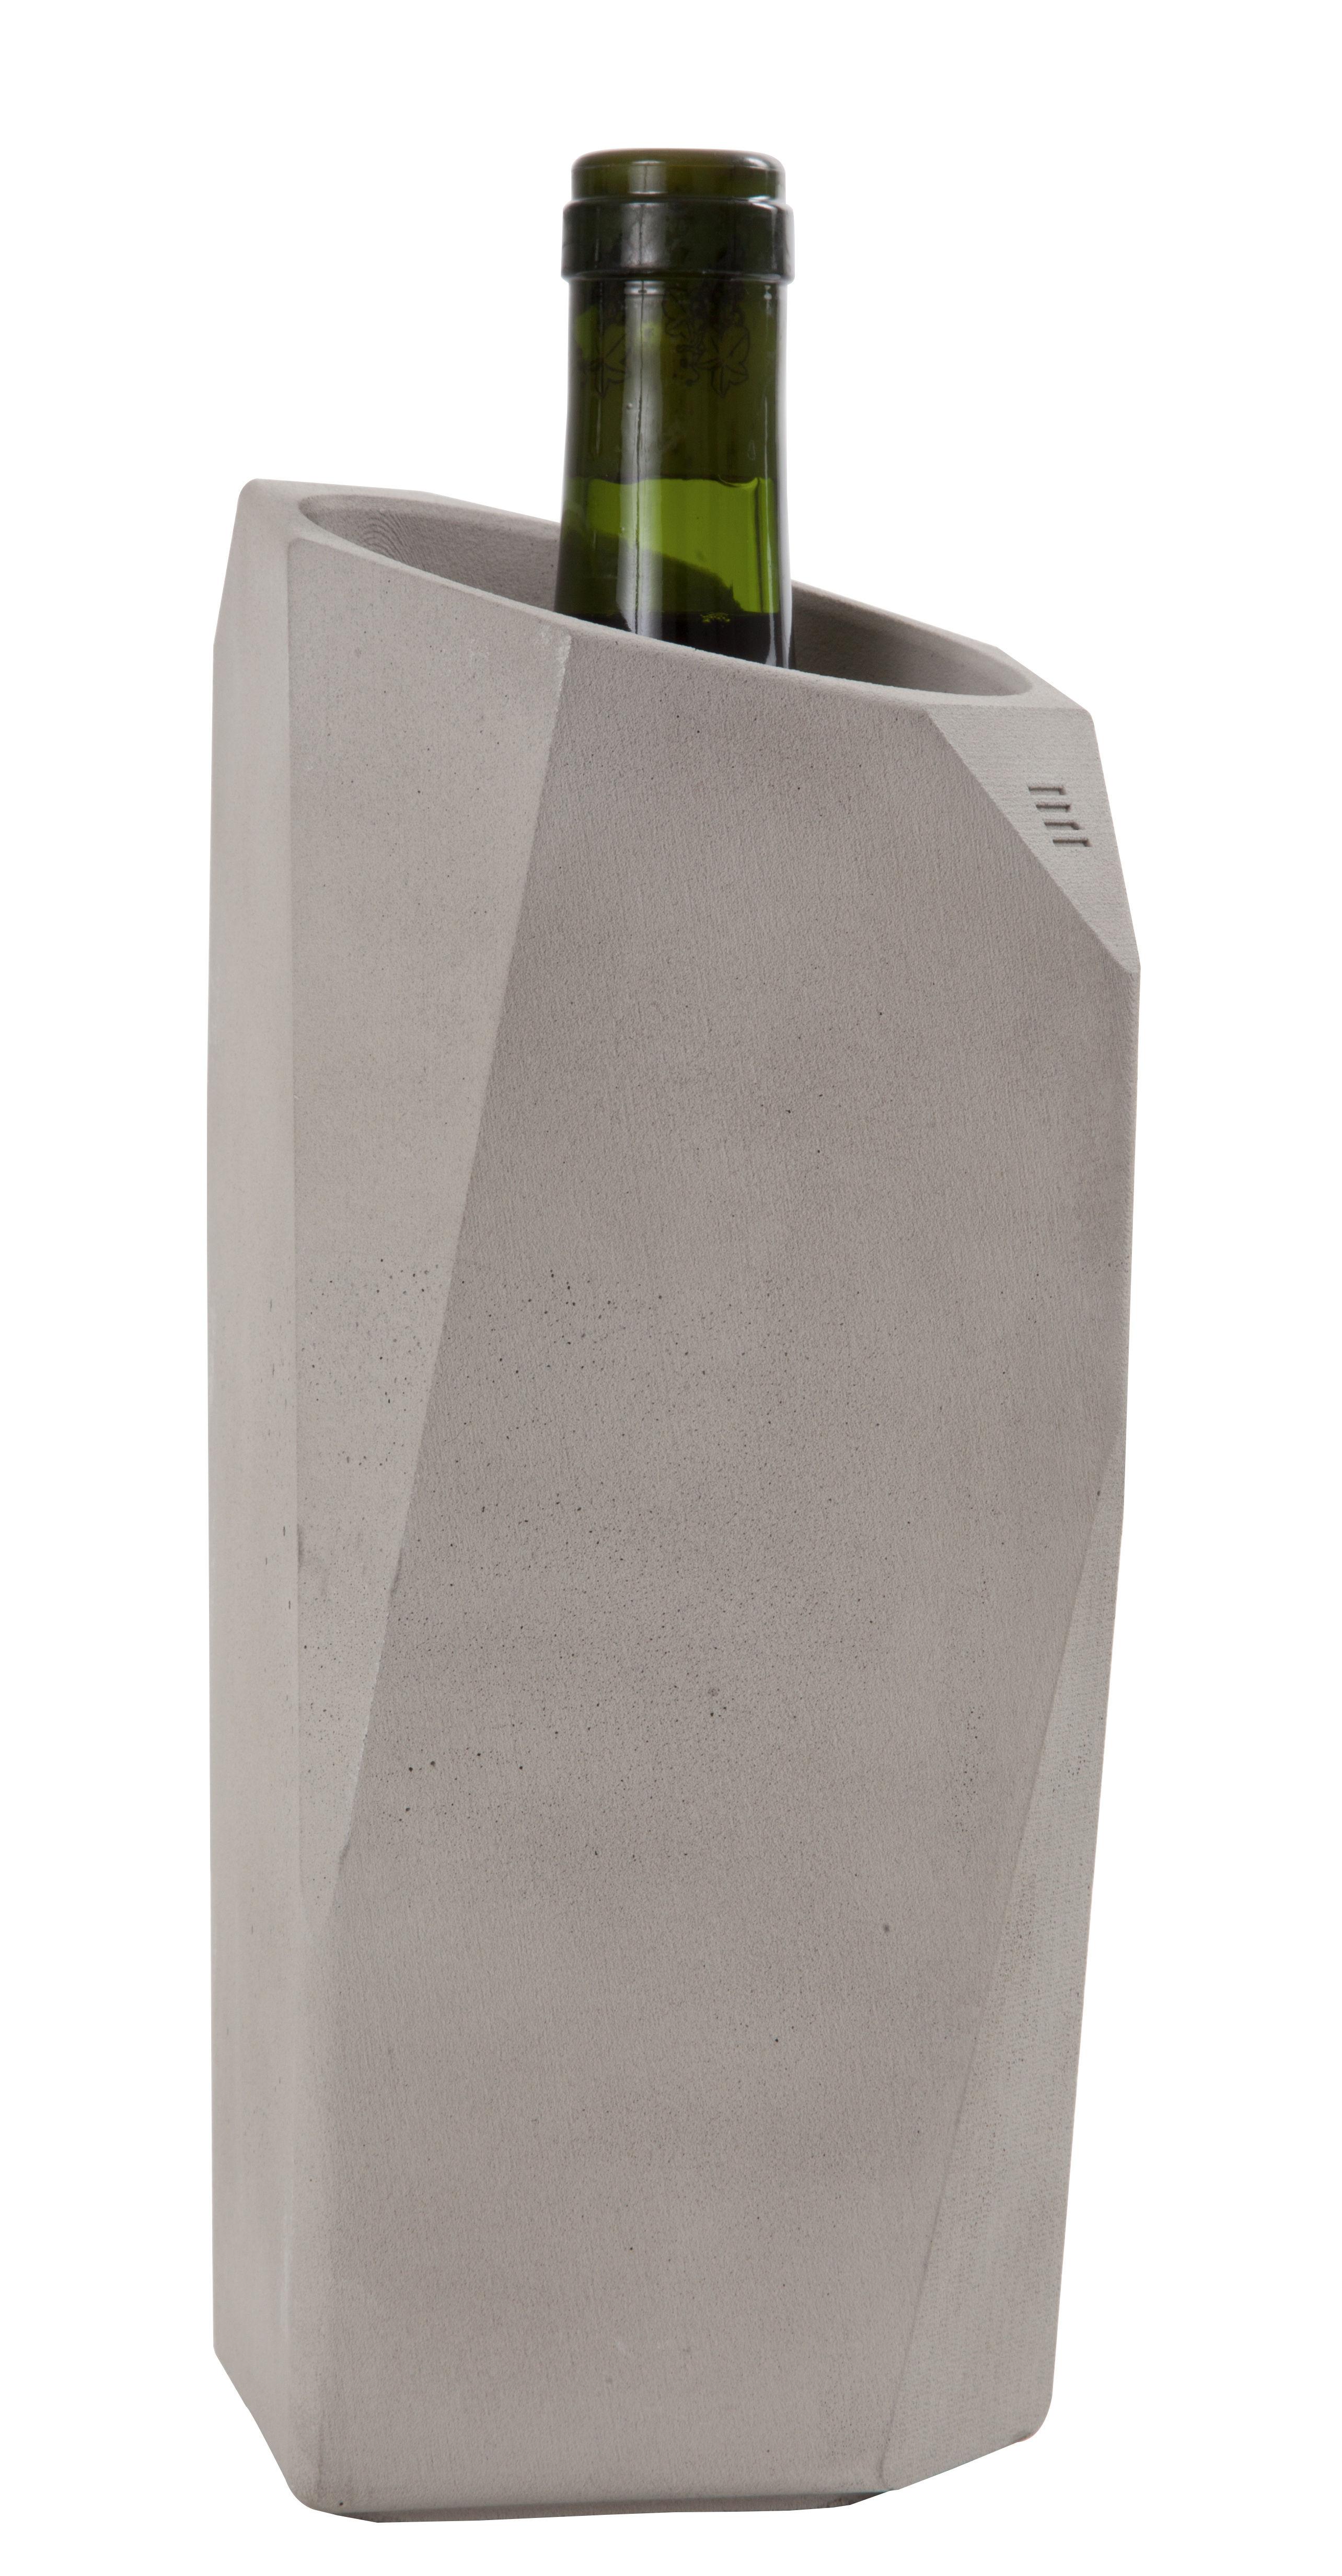 Tableware - Wine Accessories - Wine Cooler Bottle cooler - Stackable by Spécimen Editions - Grey - Concrete